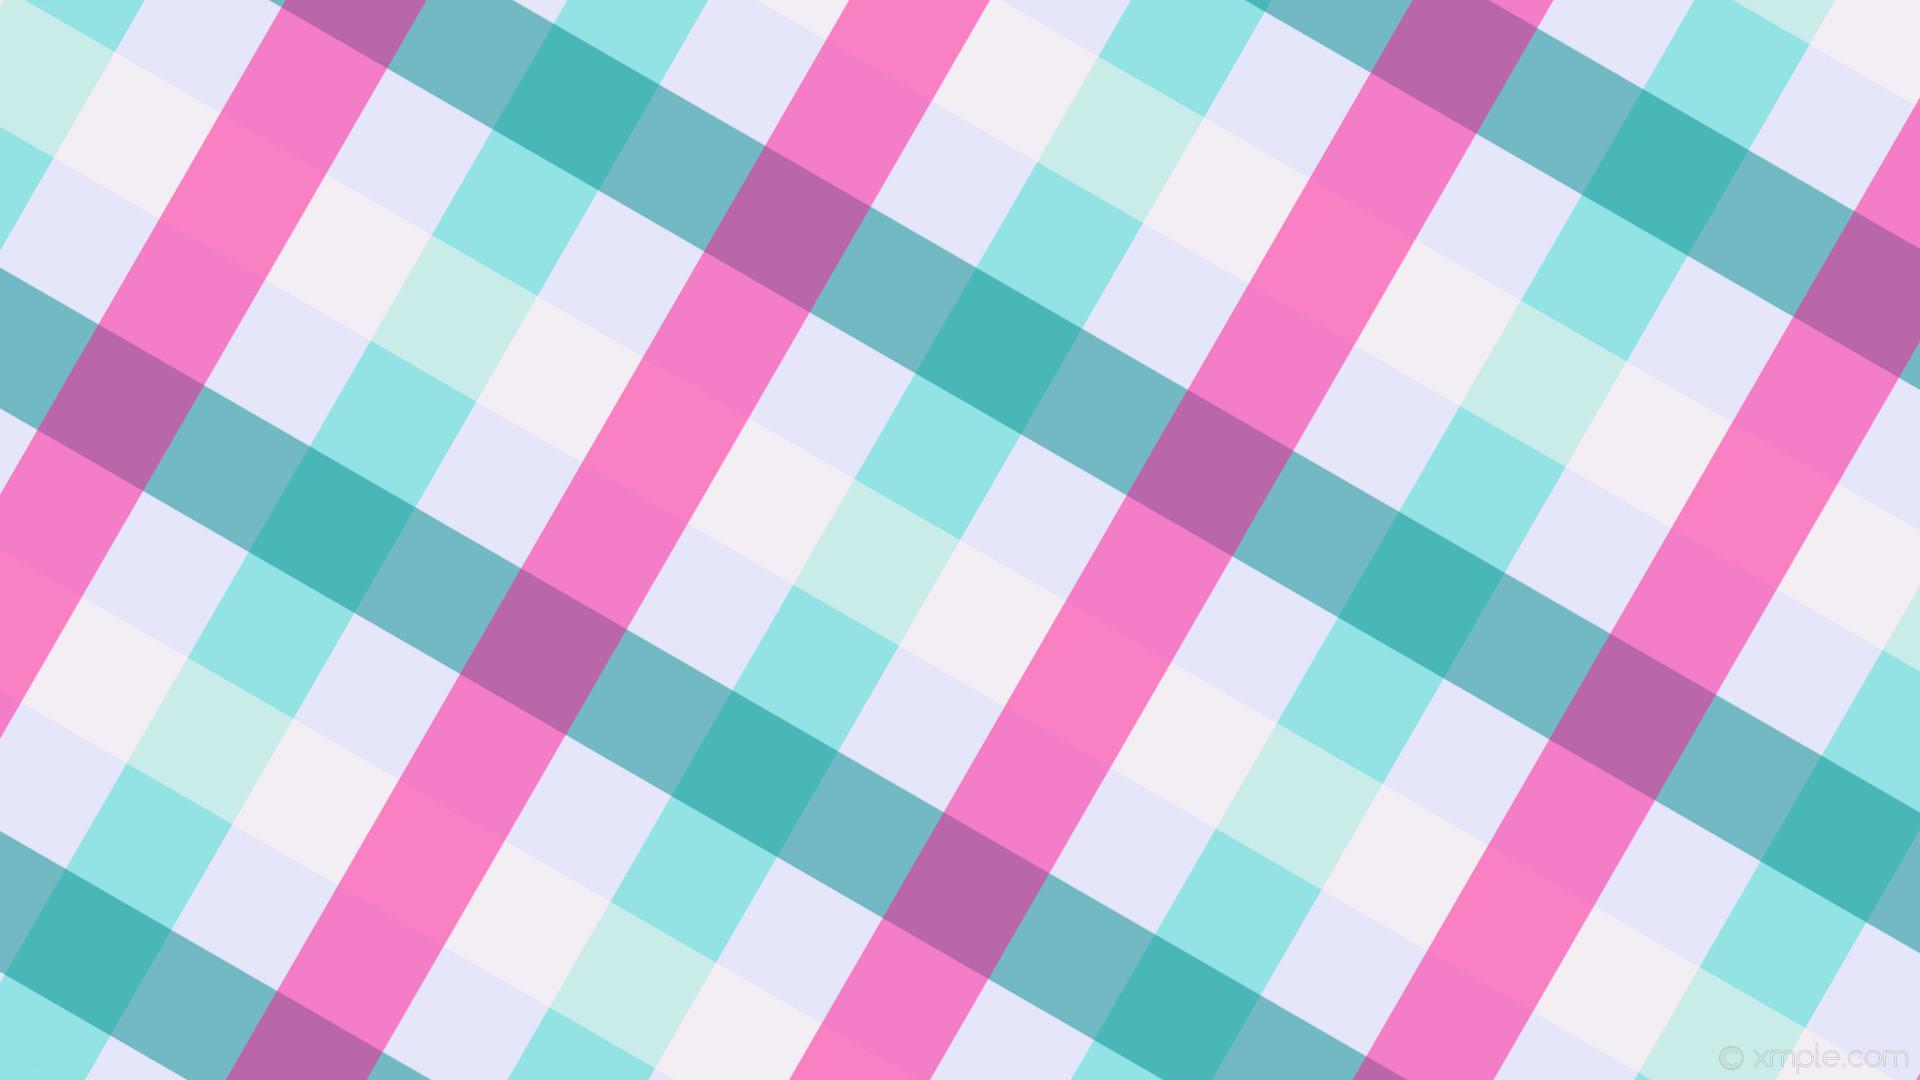 wallpaper gingham striped white pink blue green purple penta lavender  turquoise seashell dark cyan deep pink